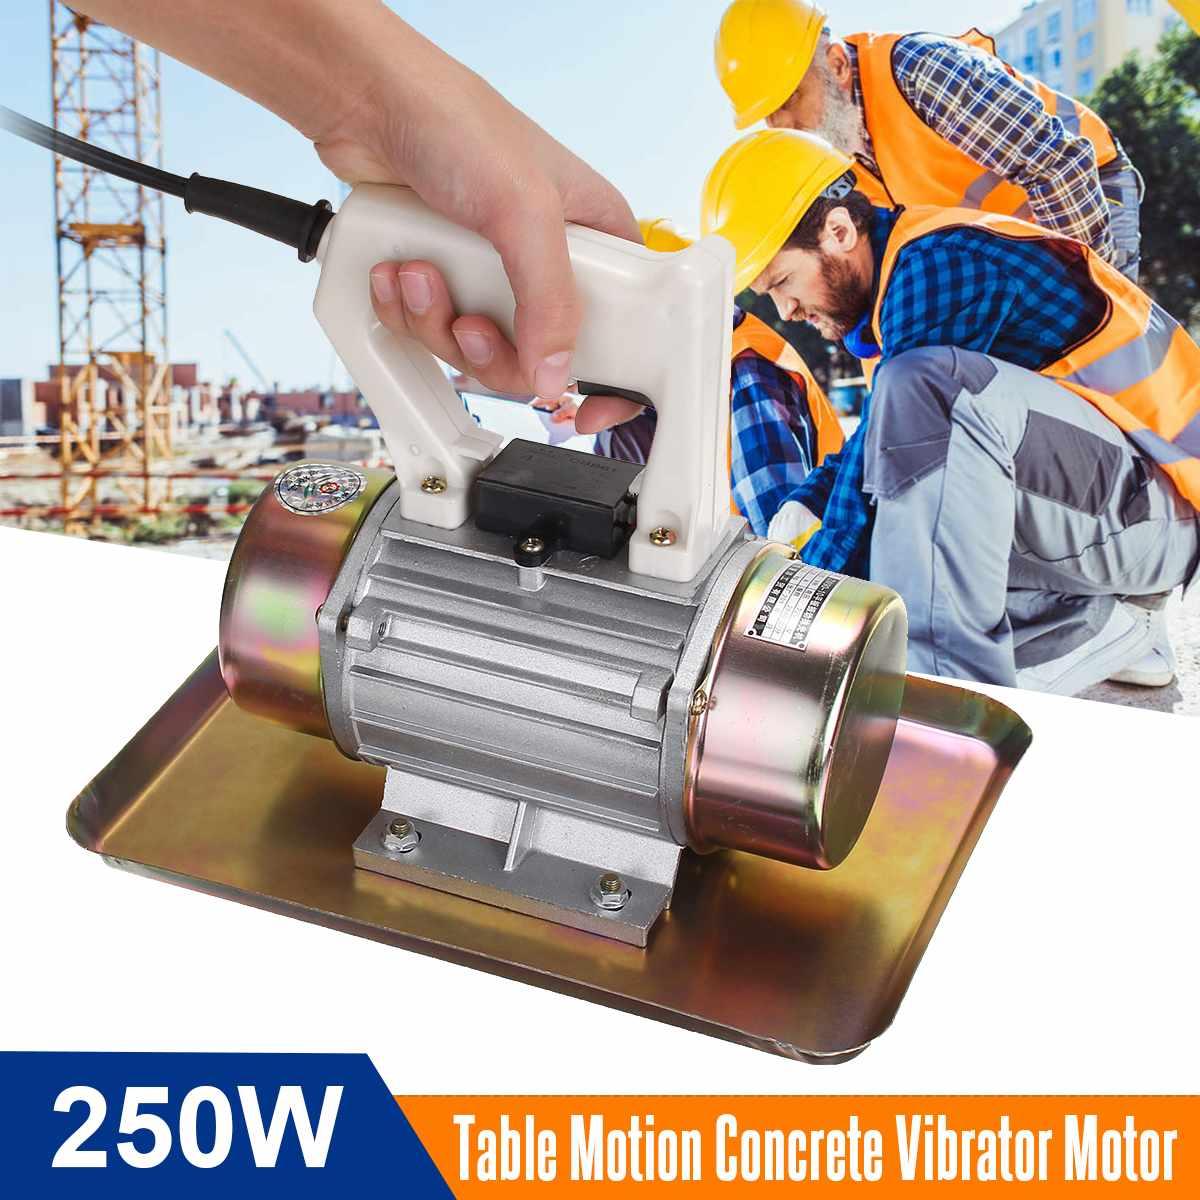 220V 250W 100kgf 2840RPM Table Motion Concrete Vibrator Motor Portable Construction Tool Hand-held Concrete Vibrator Motor New